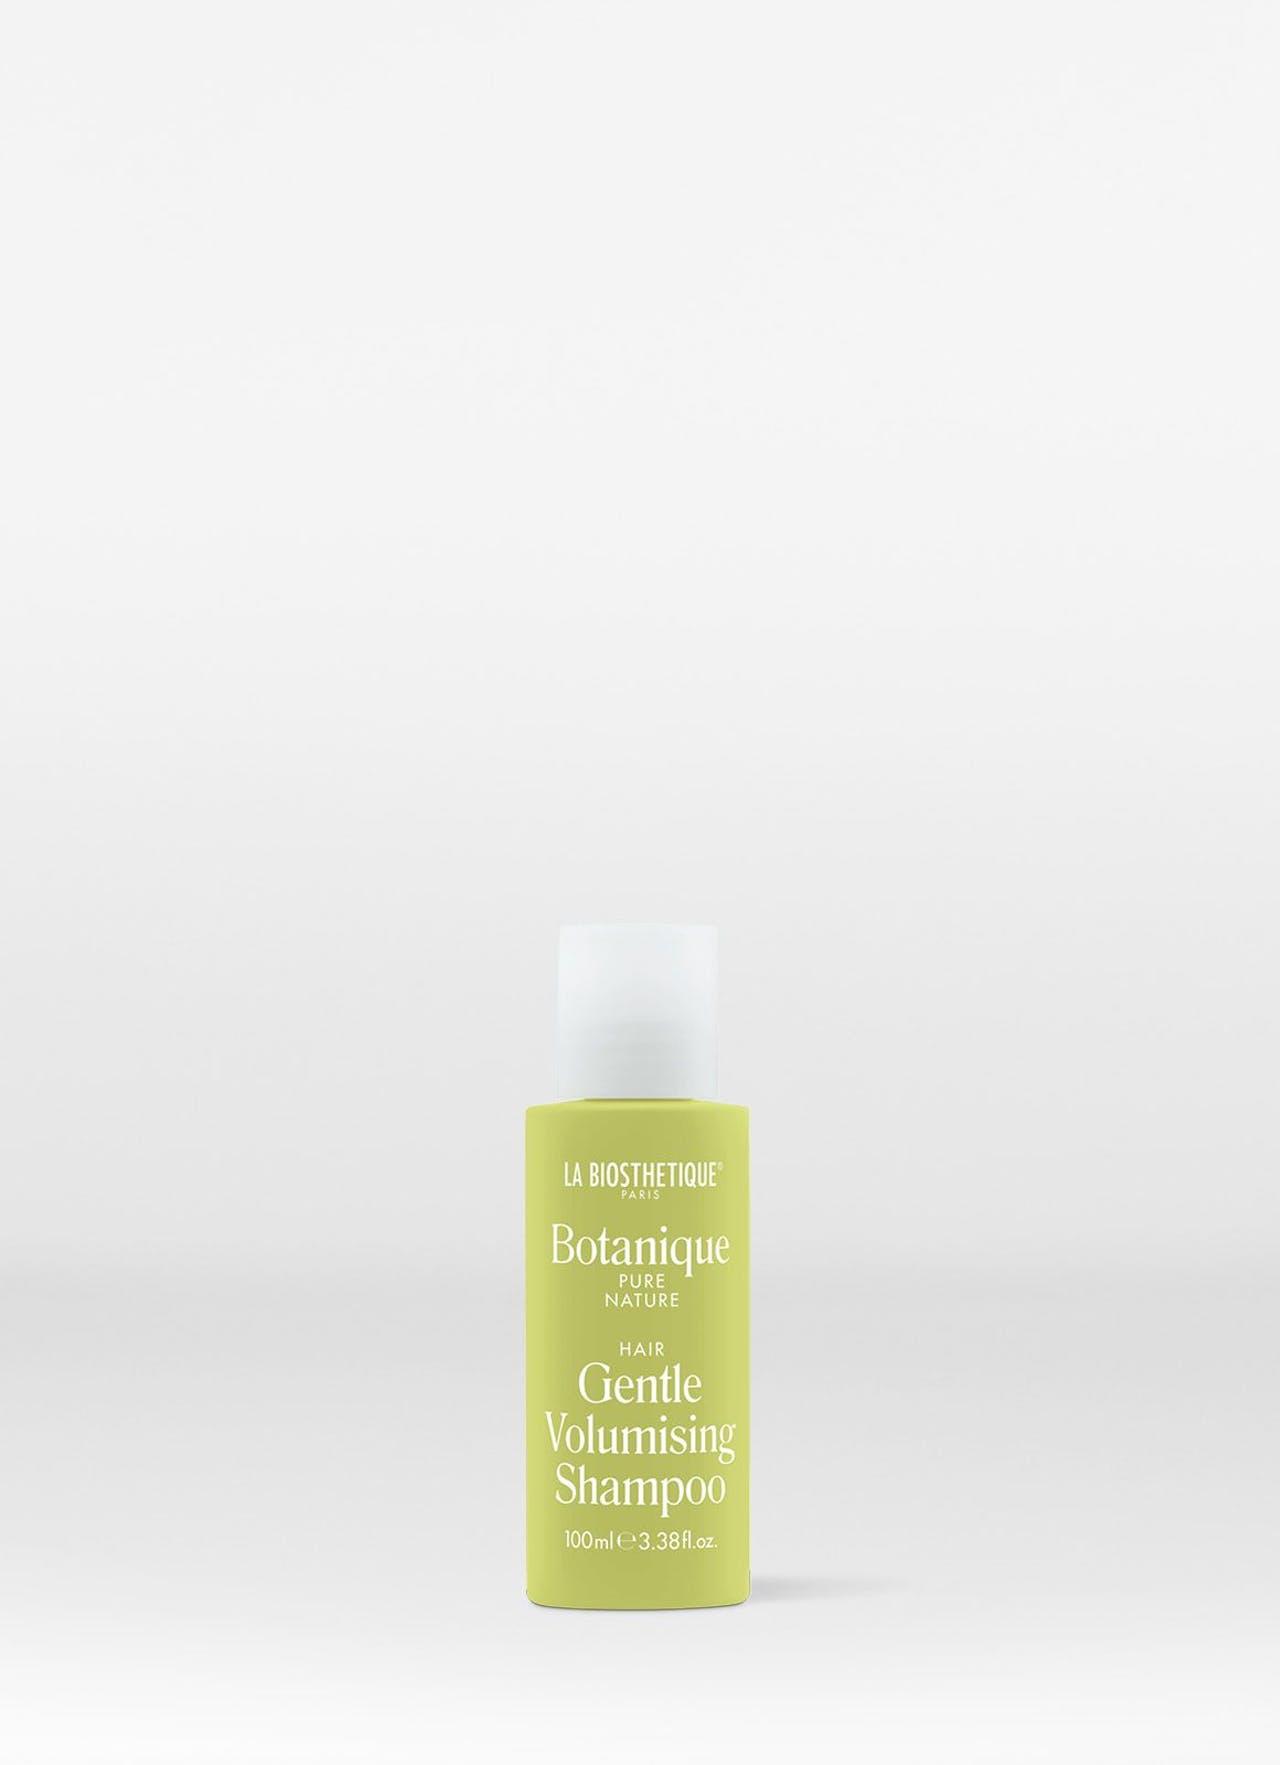 Gentle Volumising Shampoo